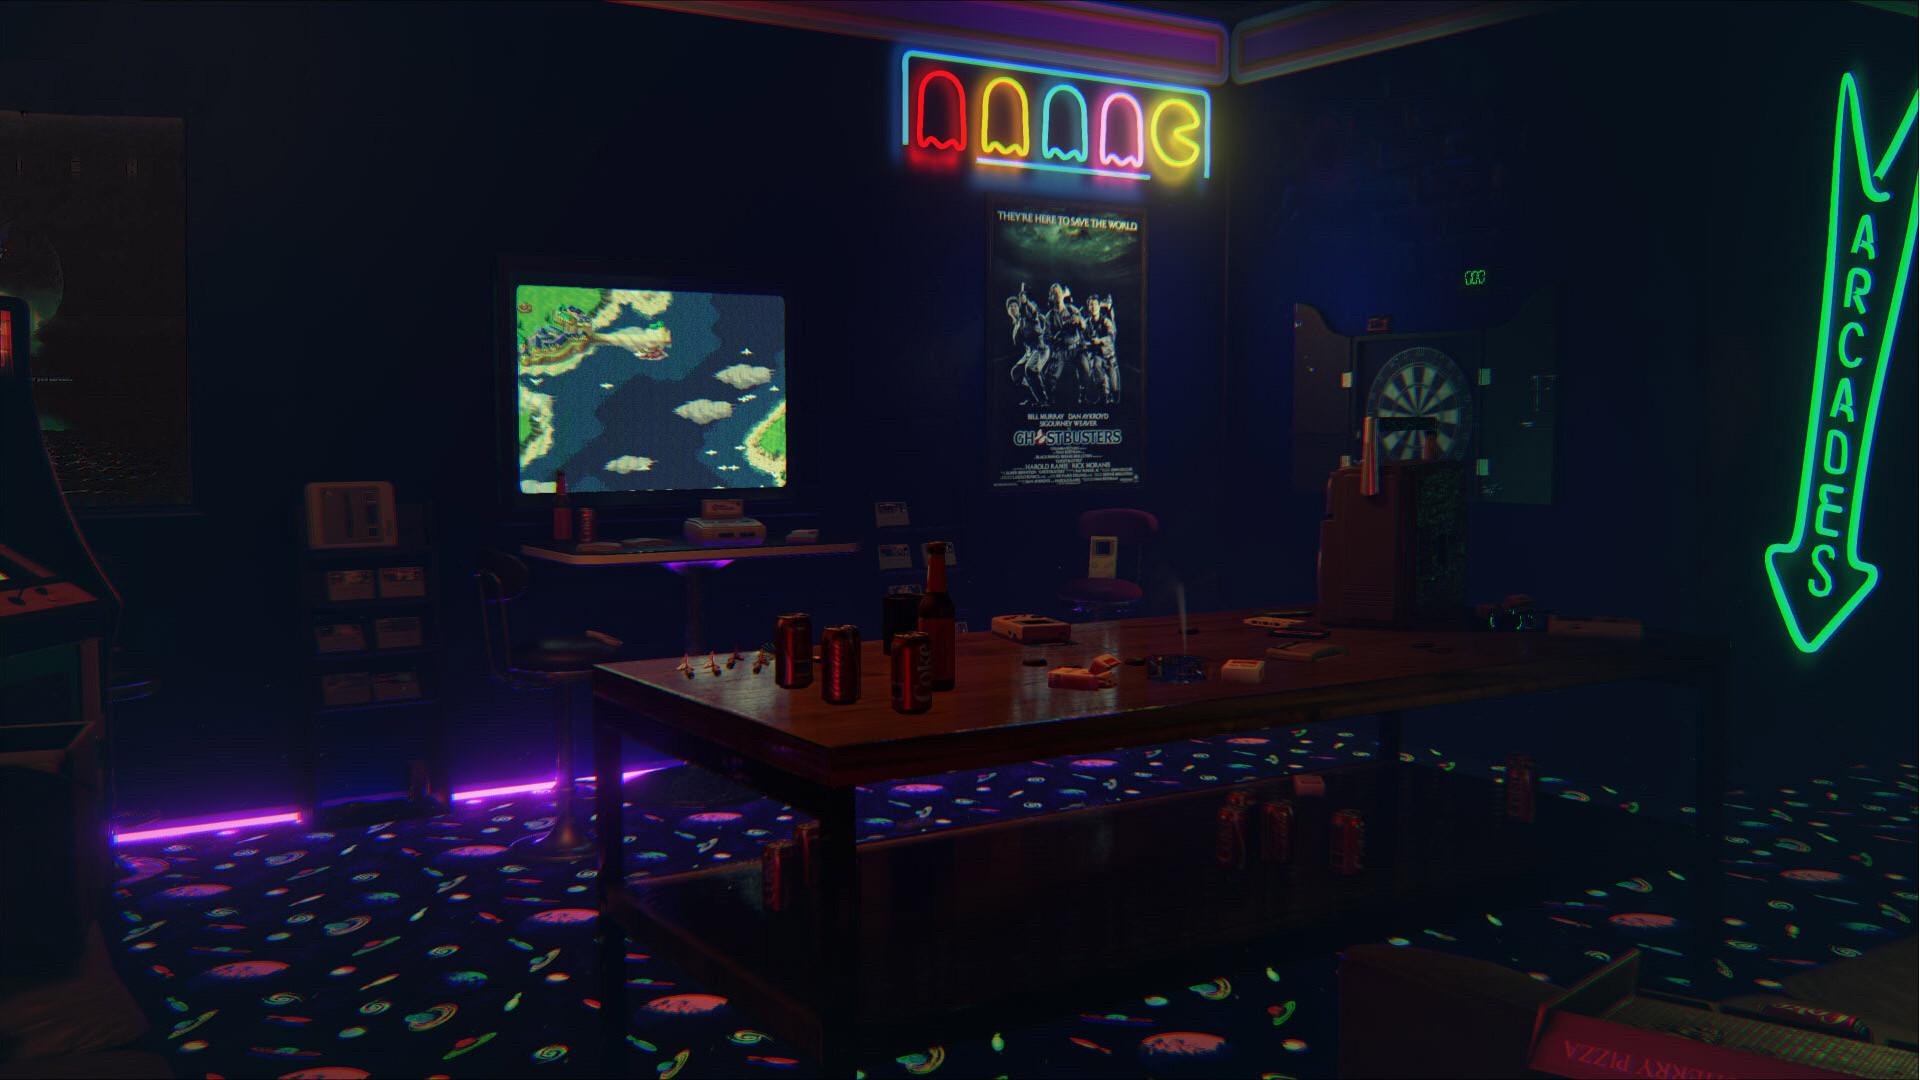 xs1sdog0n1t5nrtyn8ny.jpg (1920×1080)   The Retrowave Arcade   Pinterest    Player one, Last night and Ready player one movie